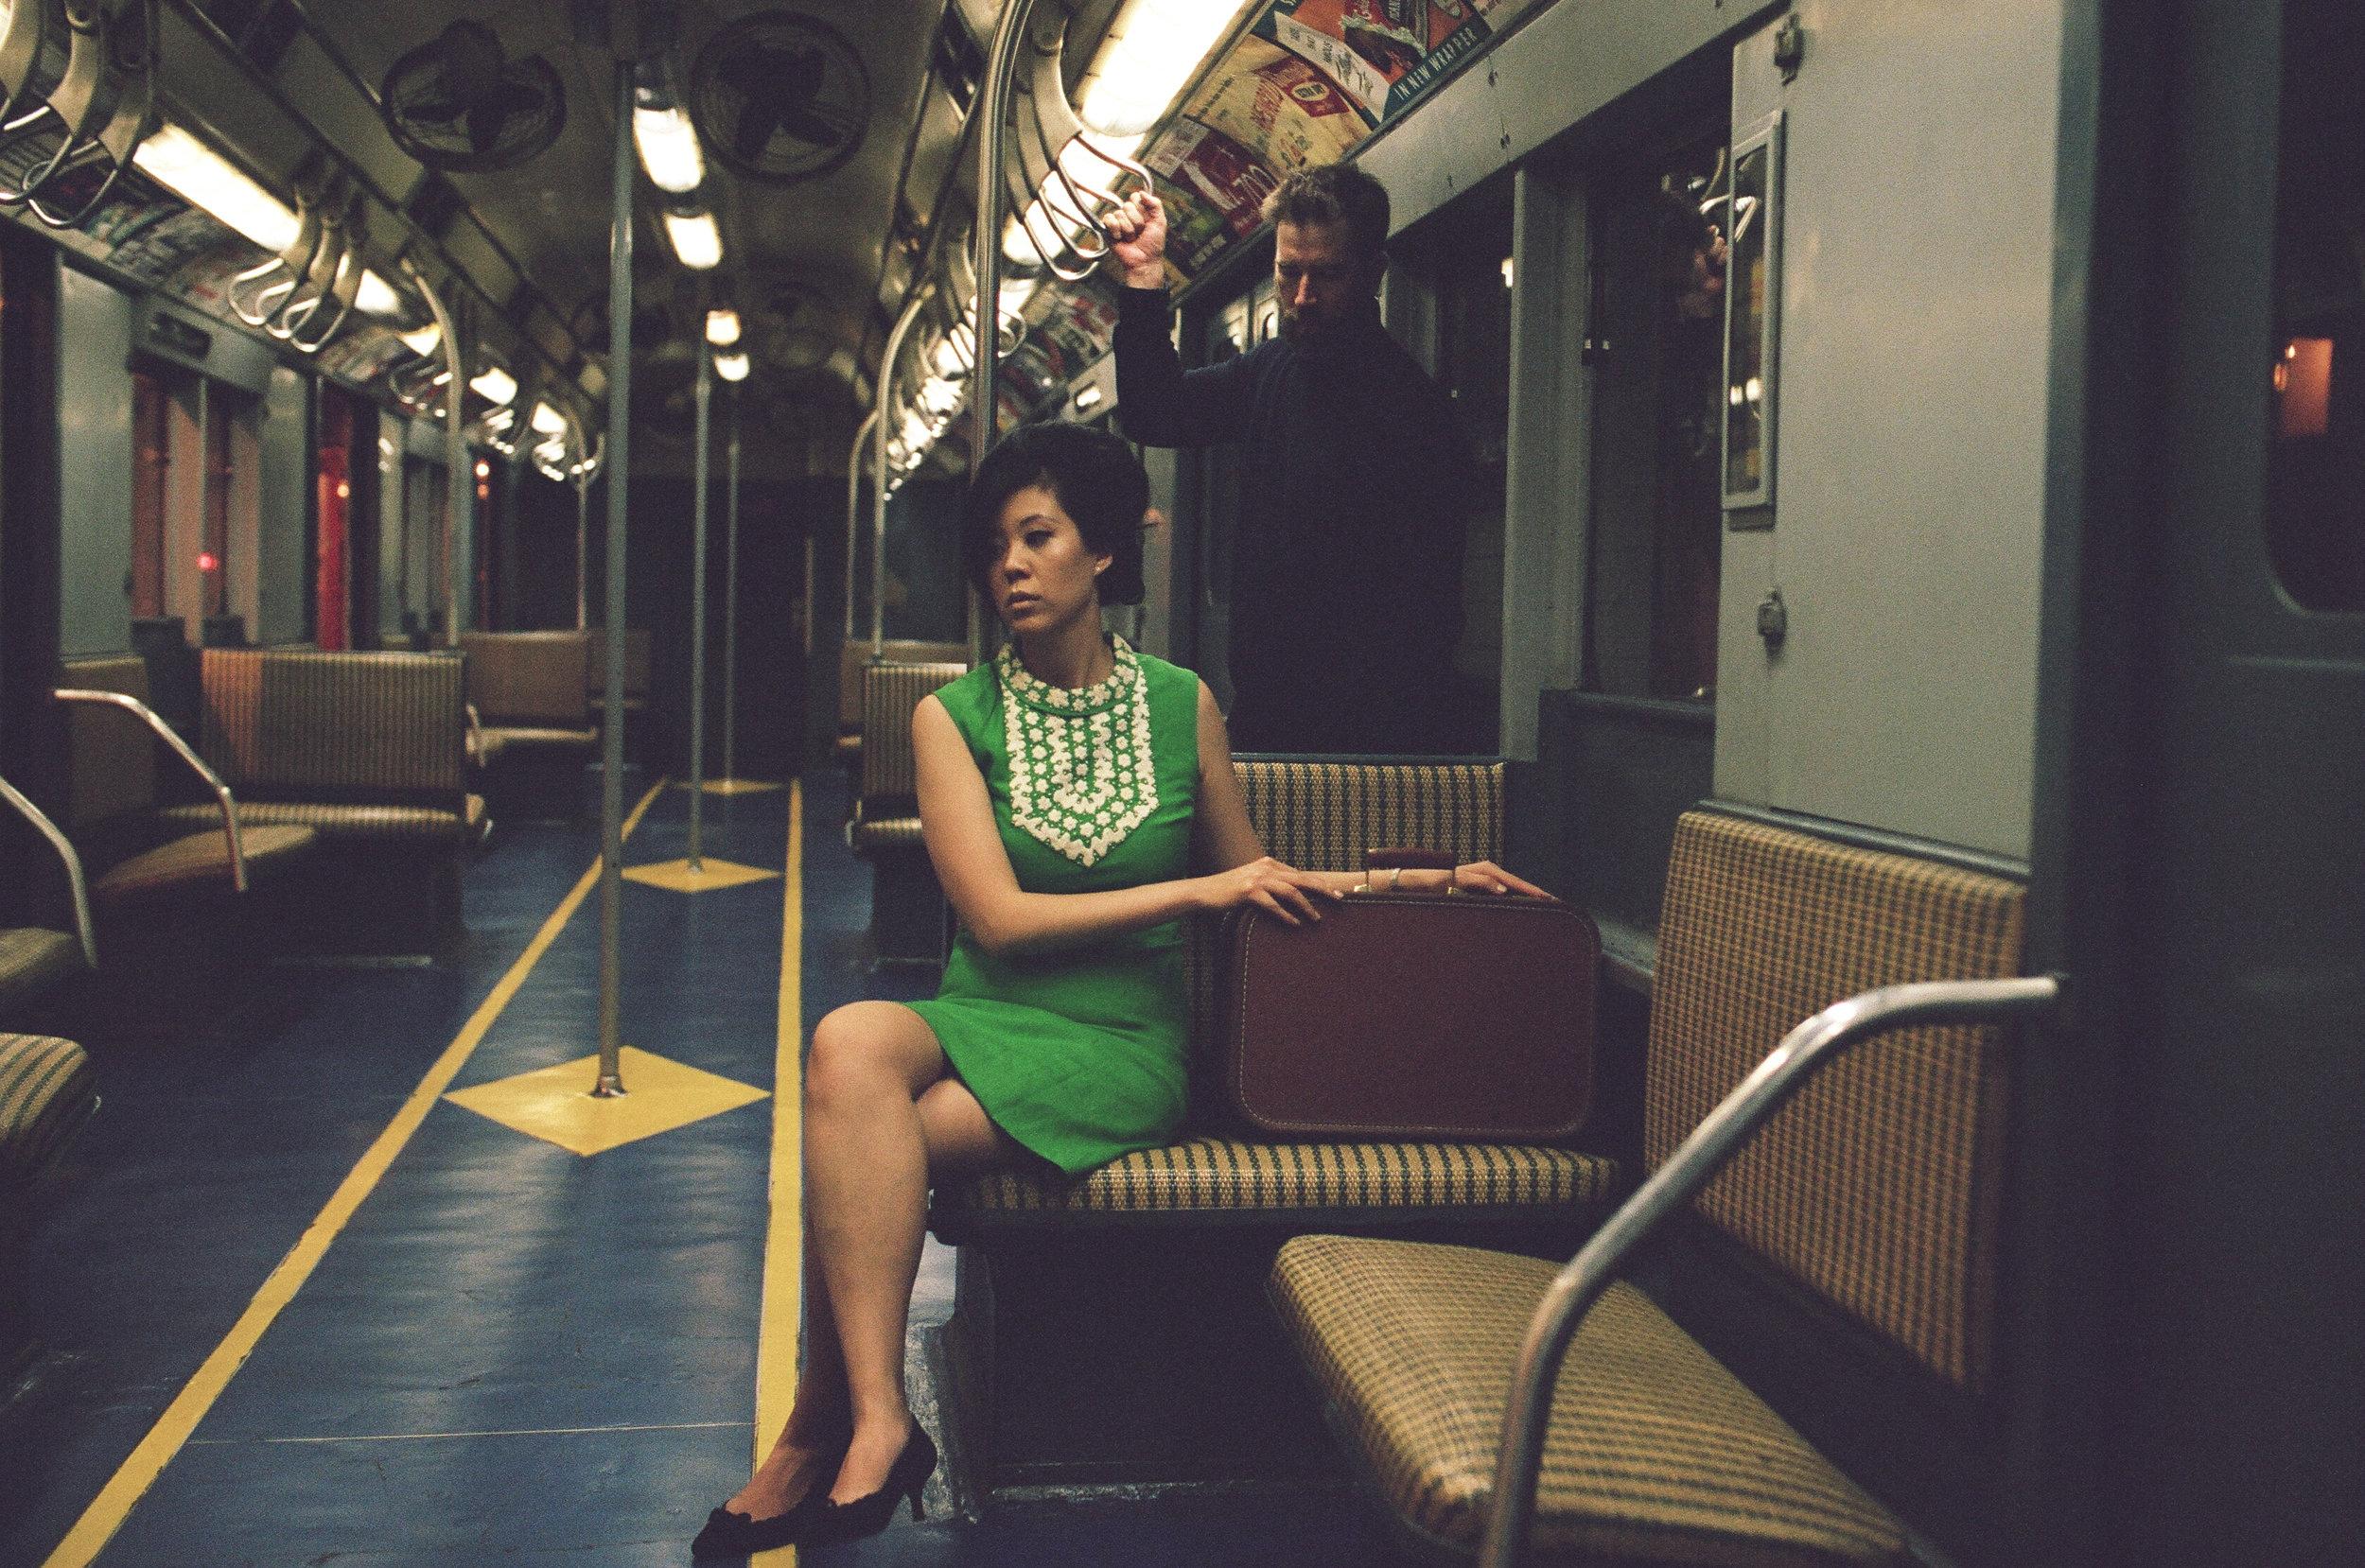 CHELLISE_MICHAEL_PHOTOGRAPHY_FILM-1116.jpg